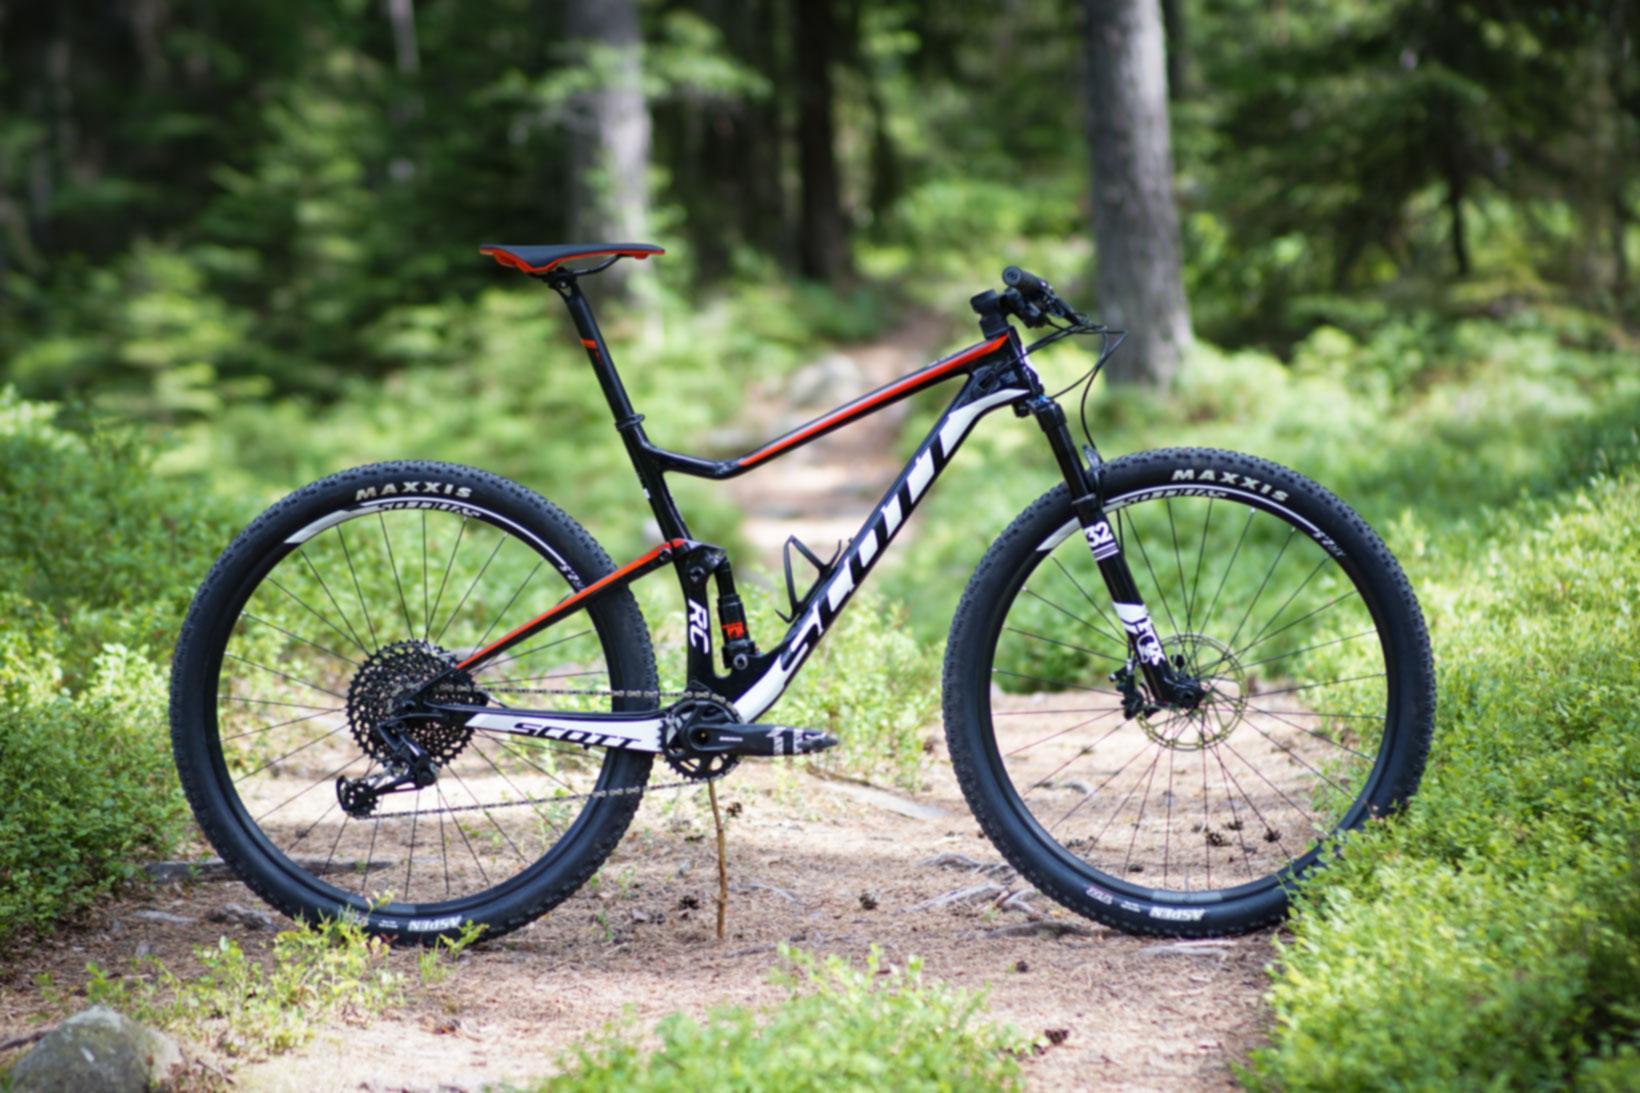 Kanon XC mot Stigcykel: Cykel nr 1 – Scott SPARK RC 900 TEAM | Svenska PN-84